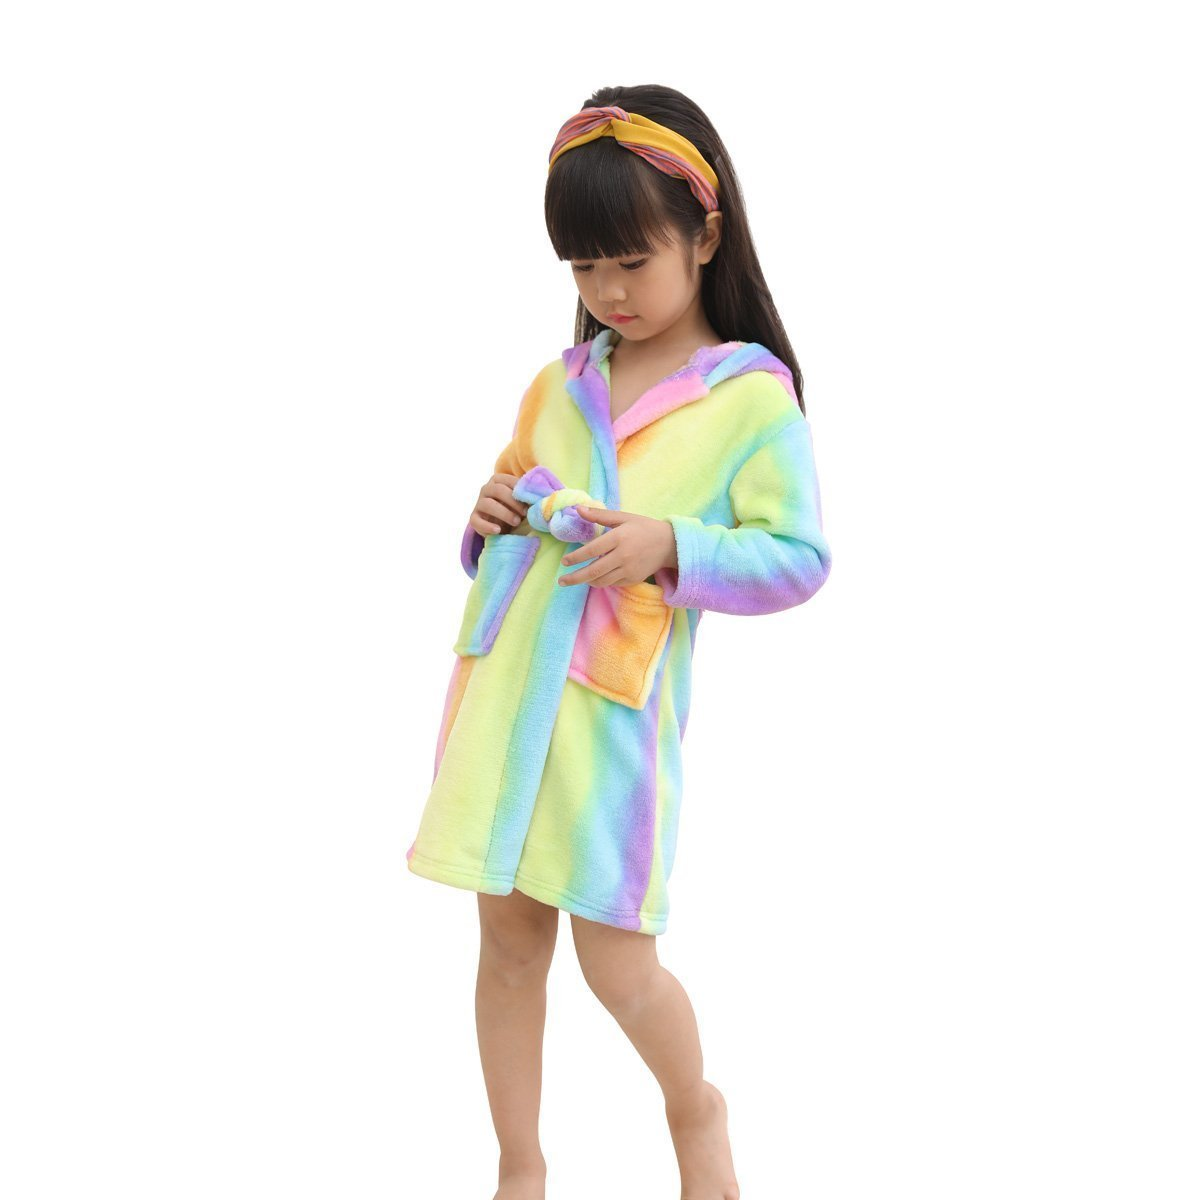 0353363939 Amazon.com  UsHigh Kids Unicorn Robe Girls Soft Plush Bathrobe Novelty  Hooded Nightgown Gift  Clothing